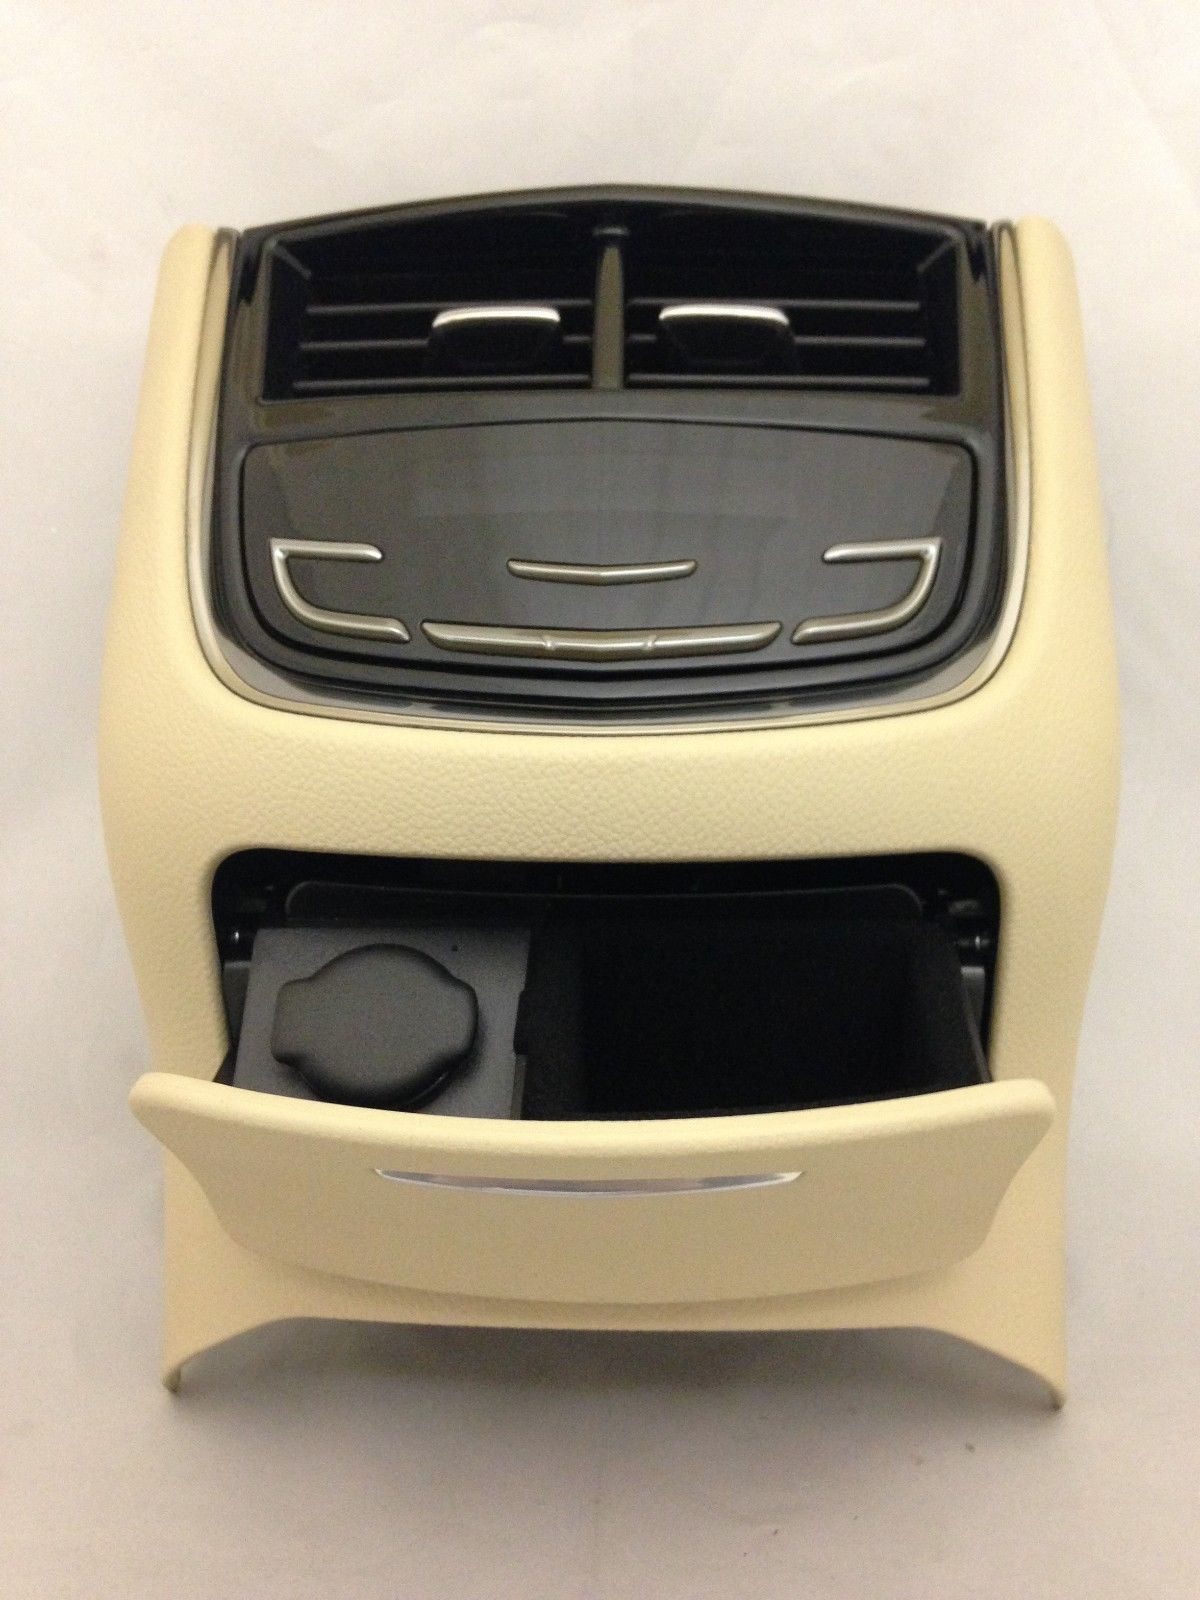 OEM New Chevy Impala 2014-2018 center floor console grab handle insert